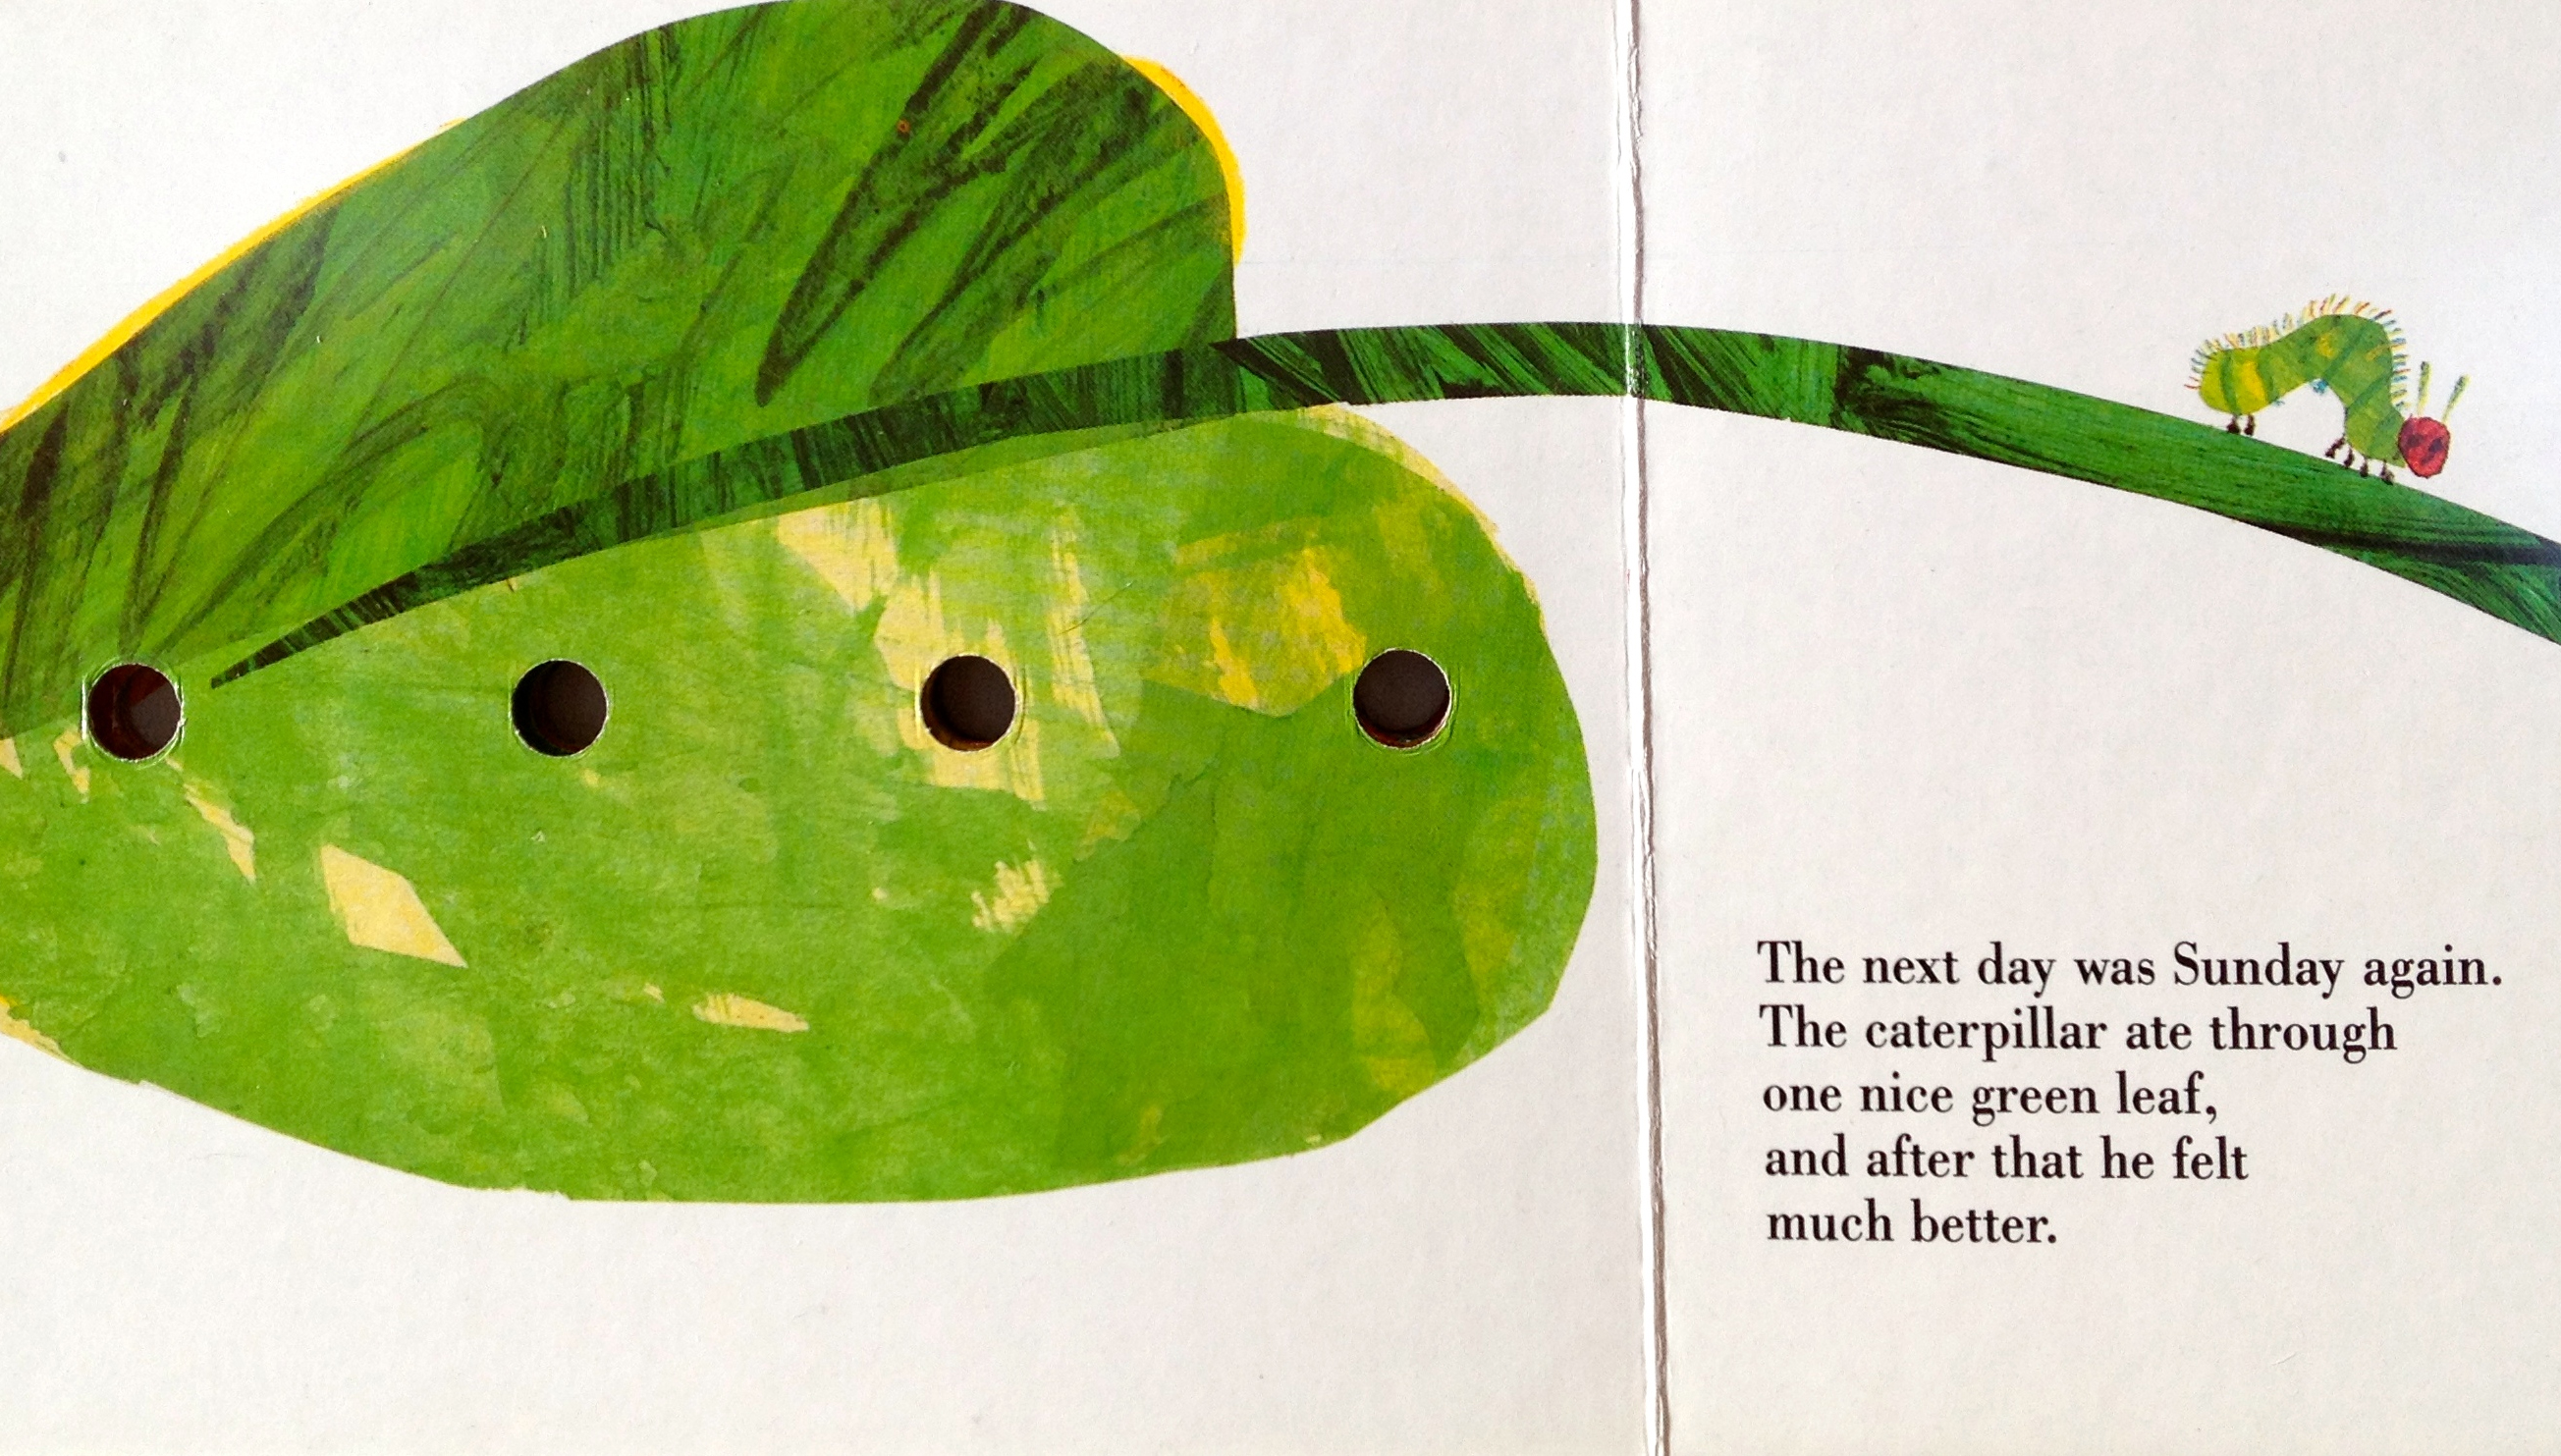 The Wisdom Of One Nice Green Leaf